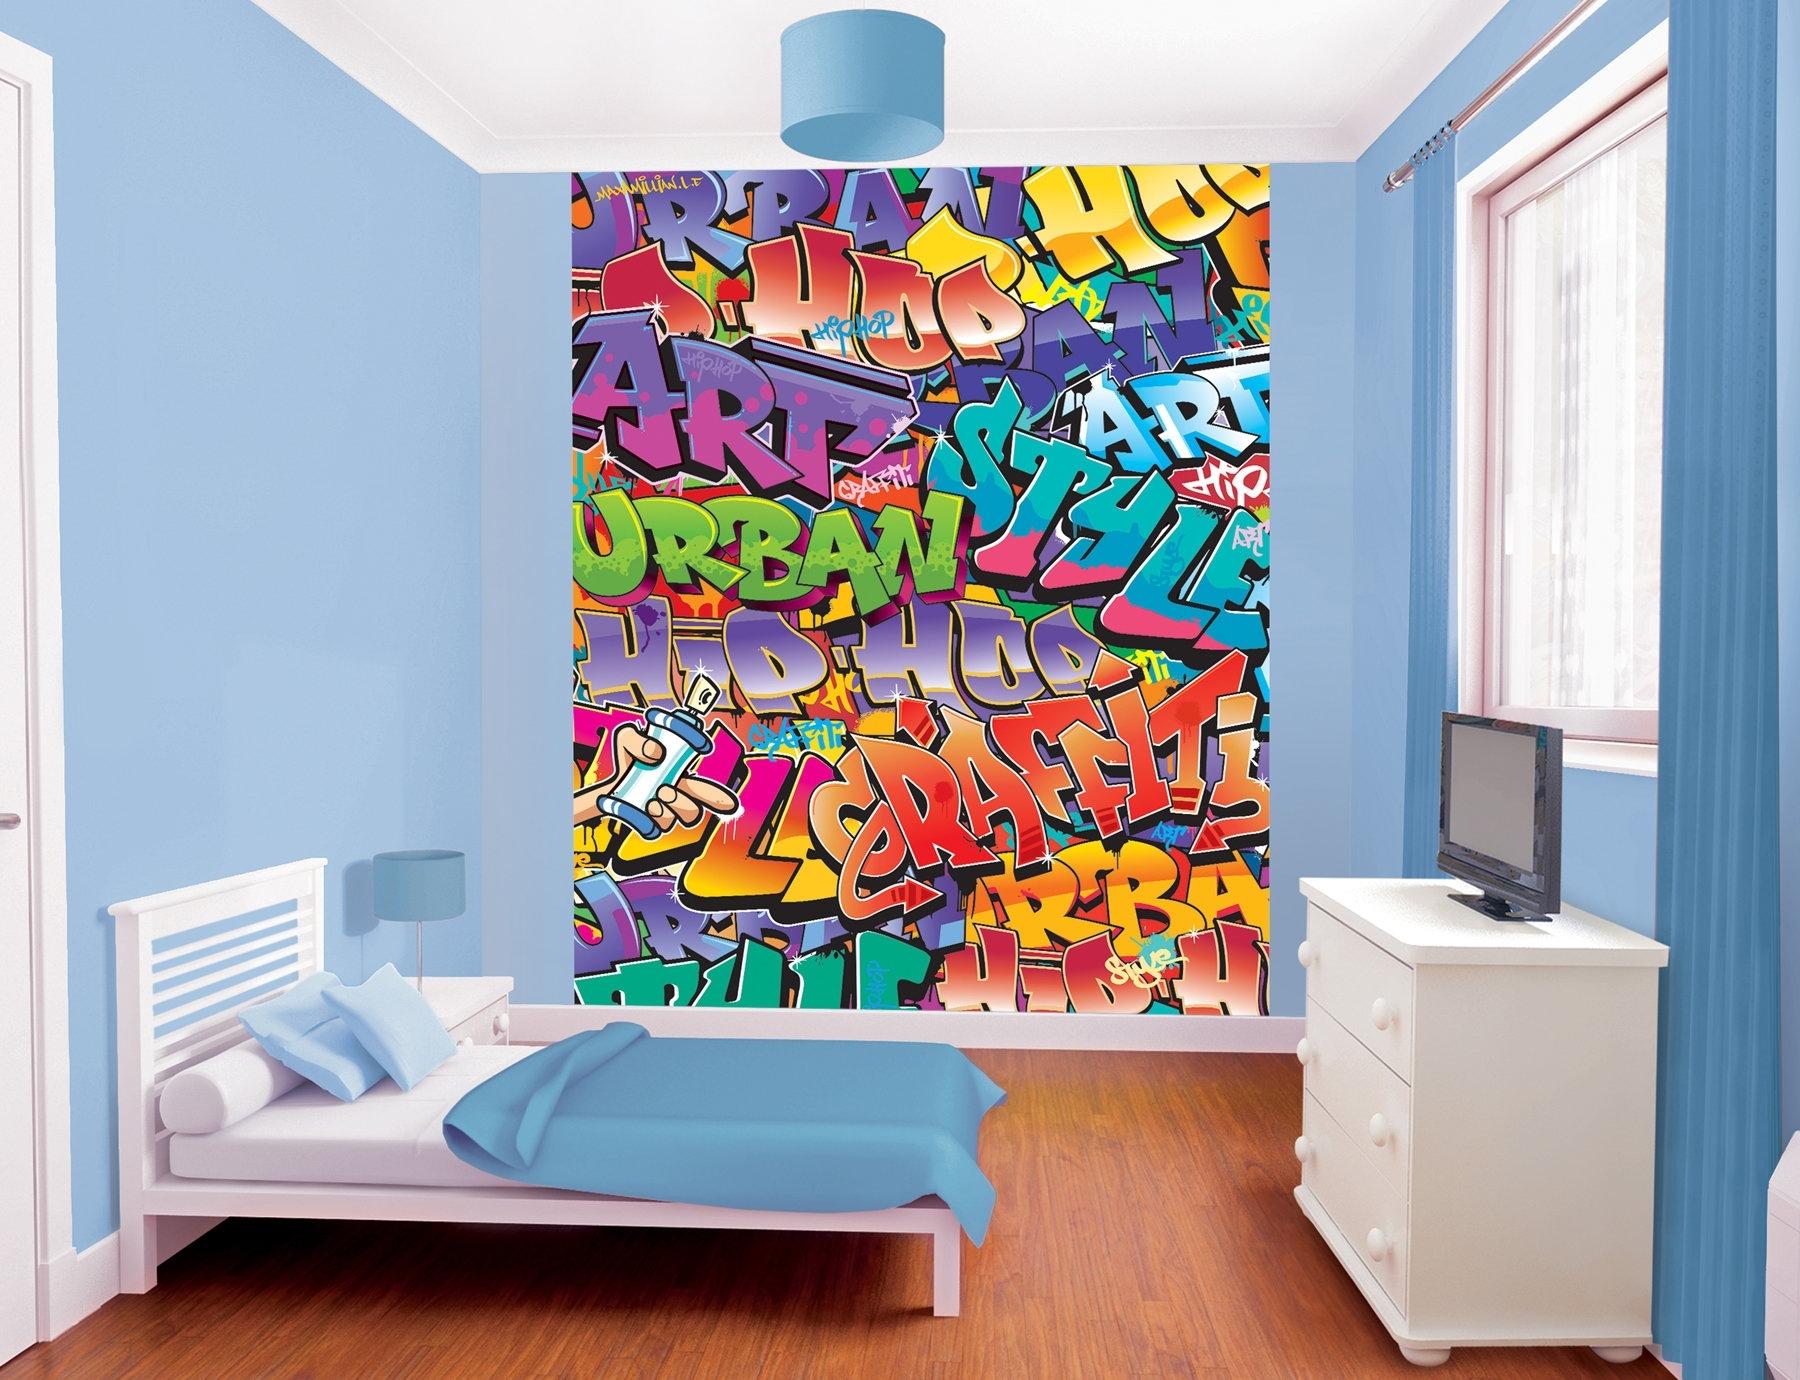 Wallpops! Walltastic Wall Art Graffiti Wall Mural | Wayfair Throughout Graffiti Wall Art (View 13 of 20)